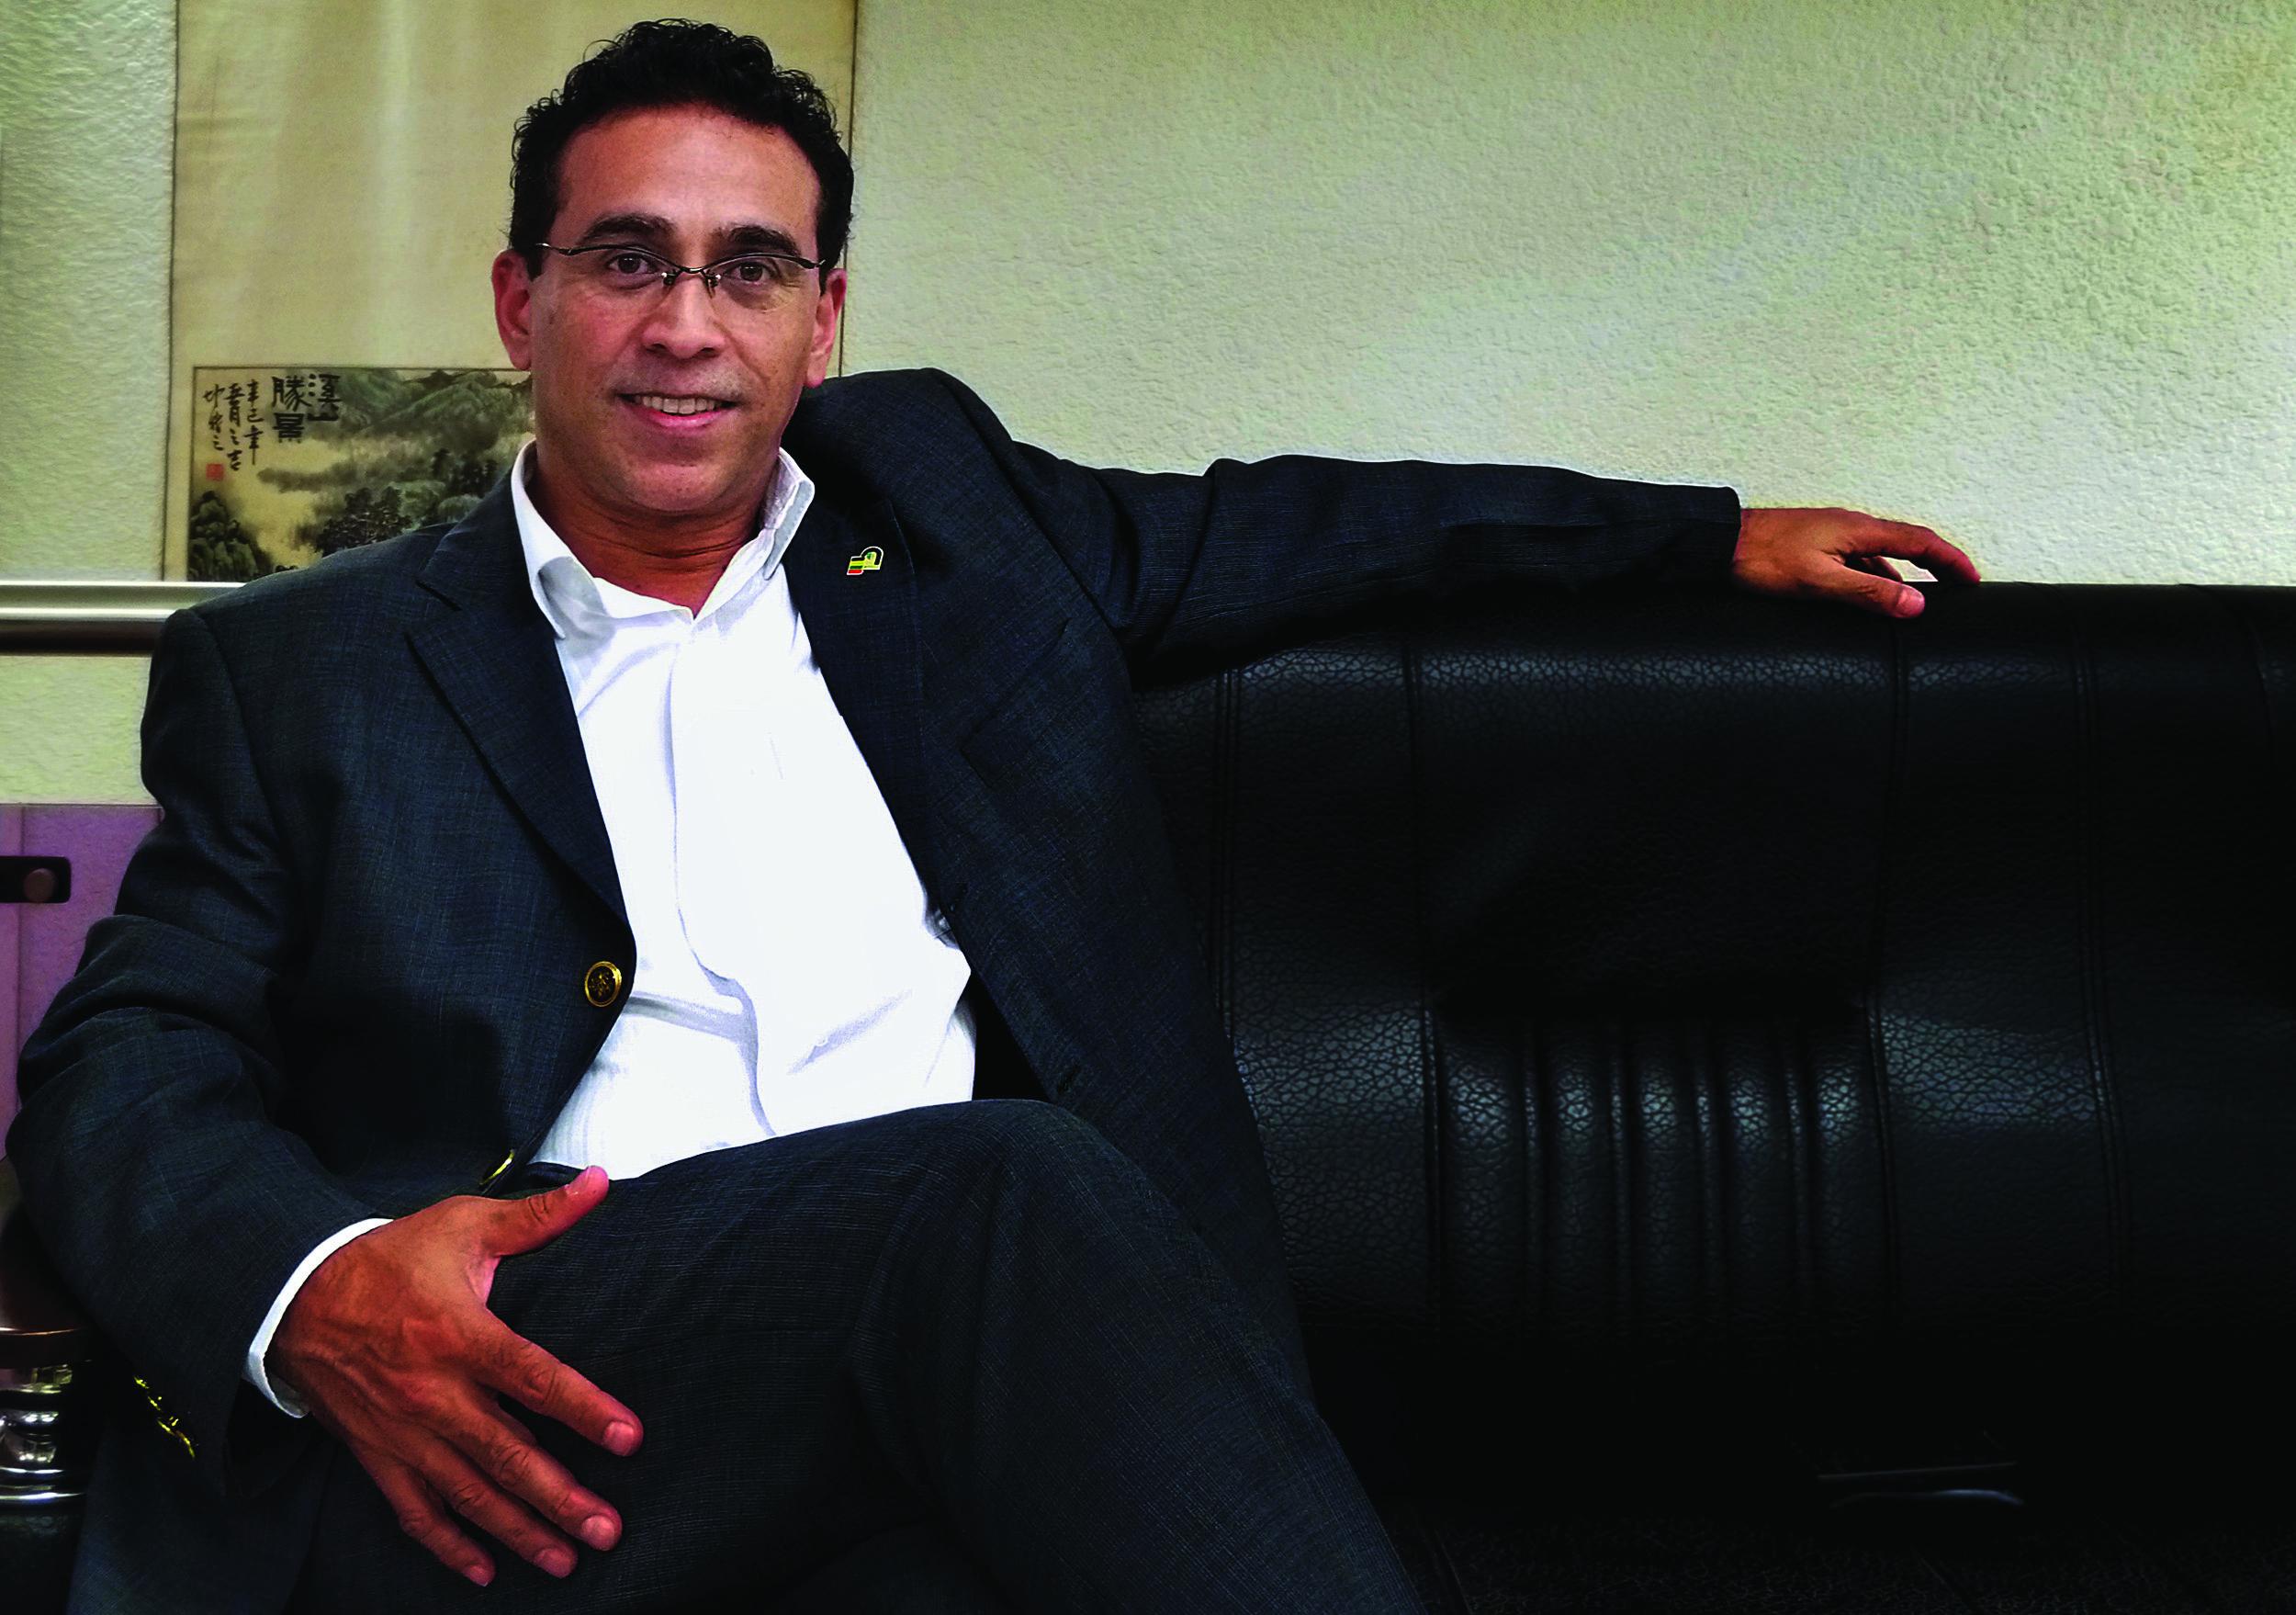 Rendas | Coutinho retira projecto e une-se a Chan Meng Kam